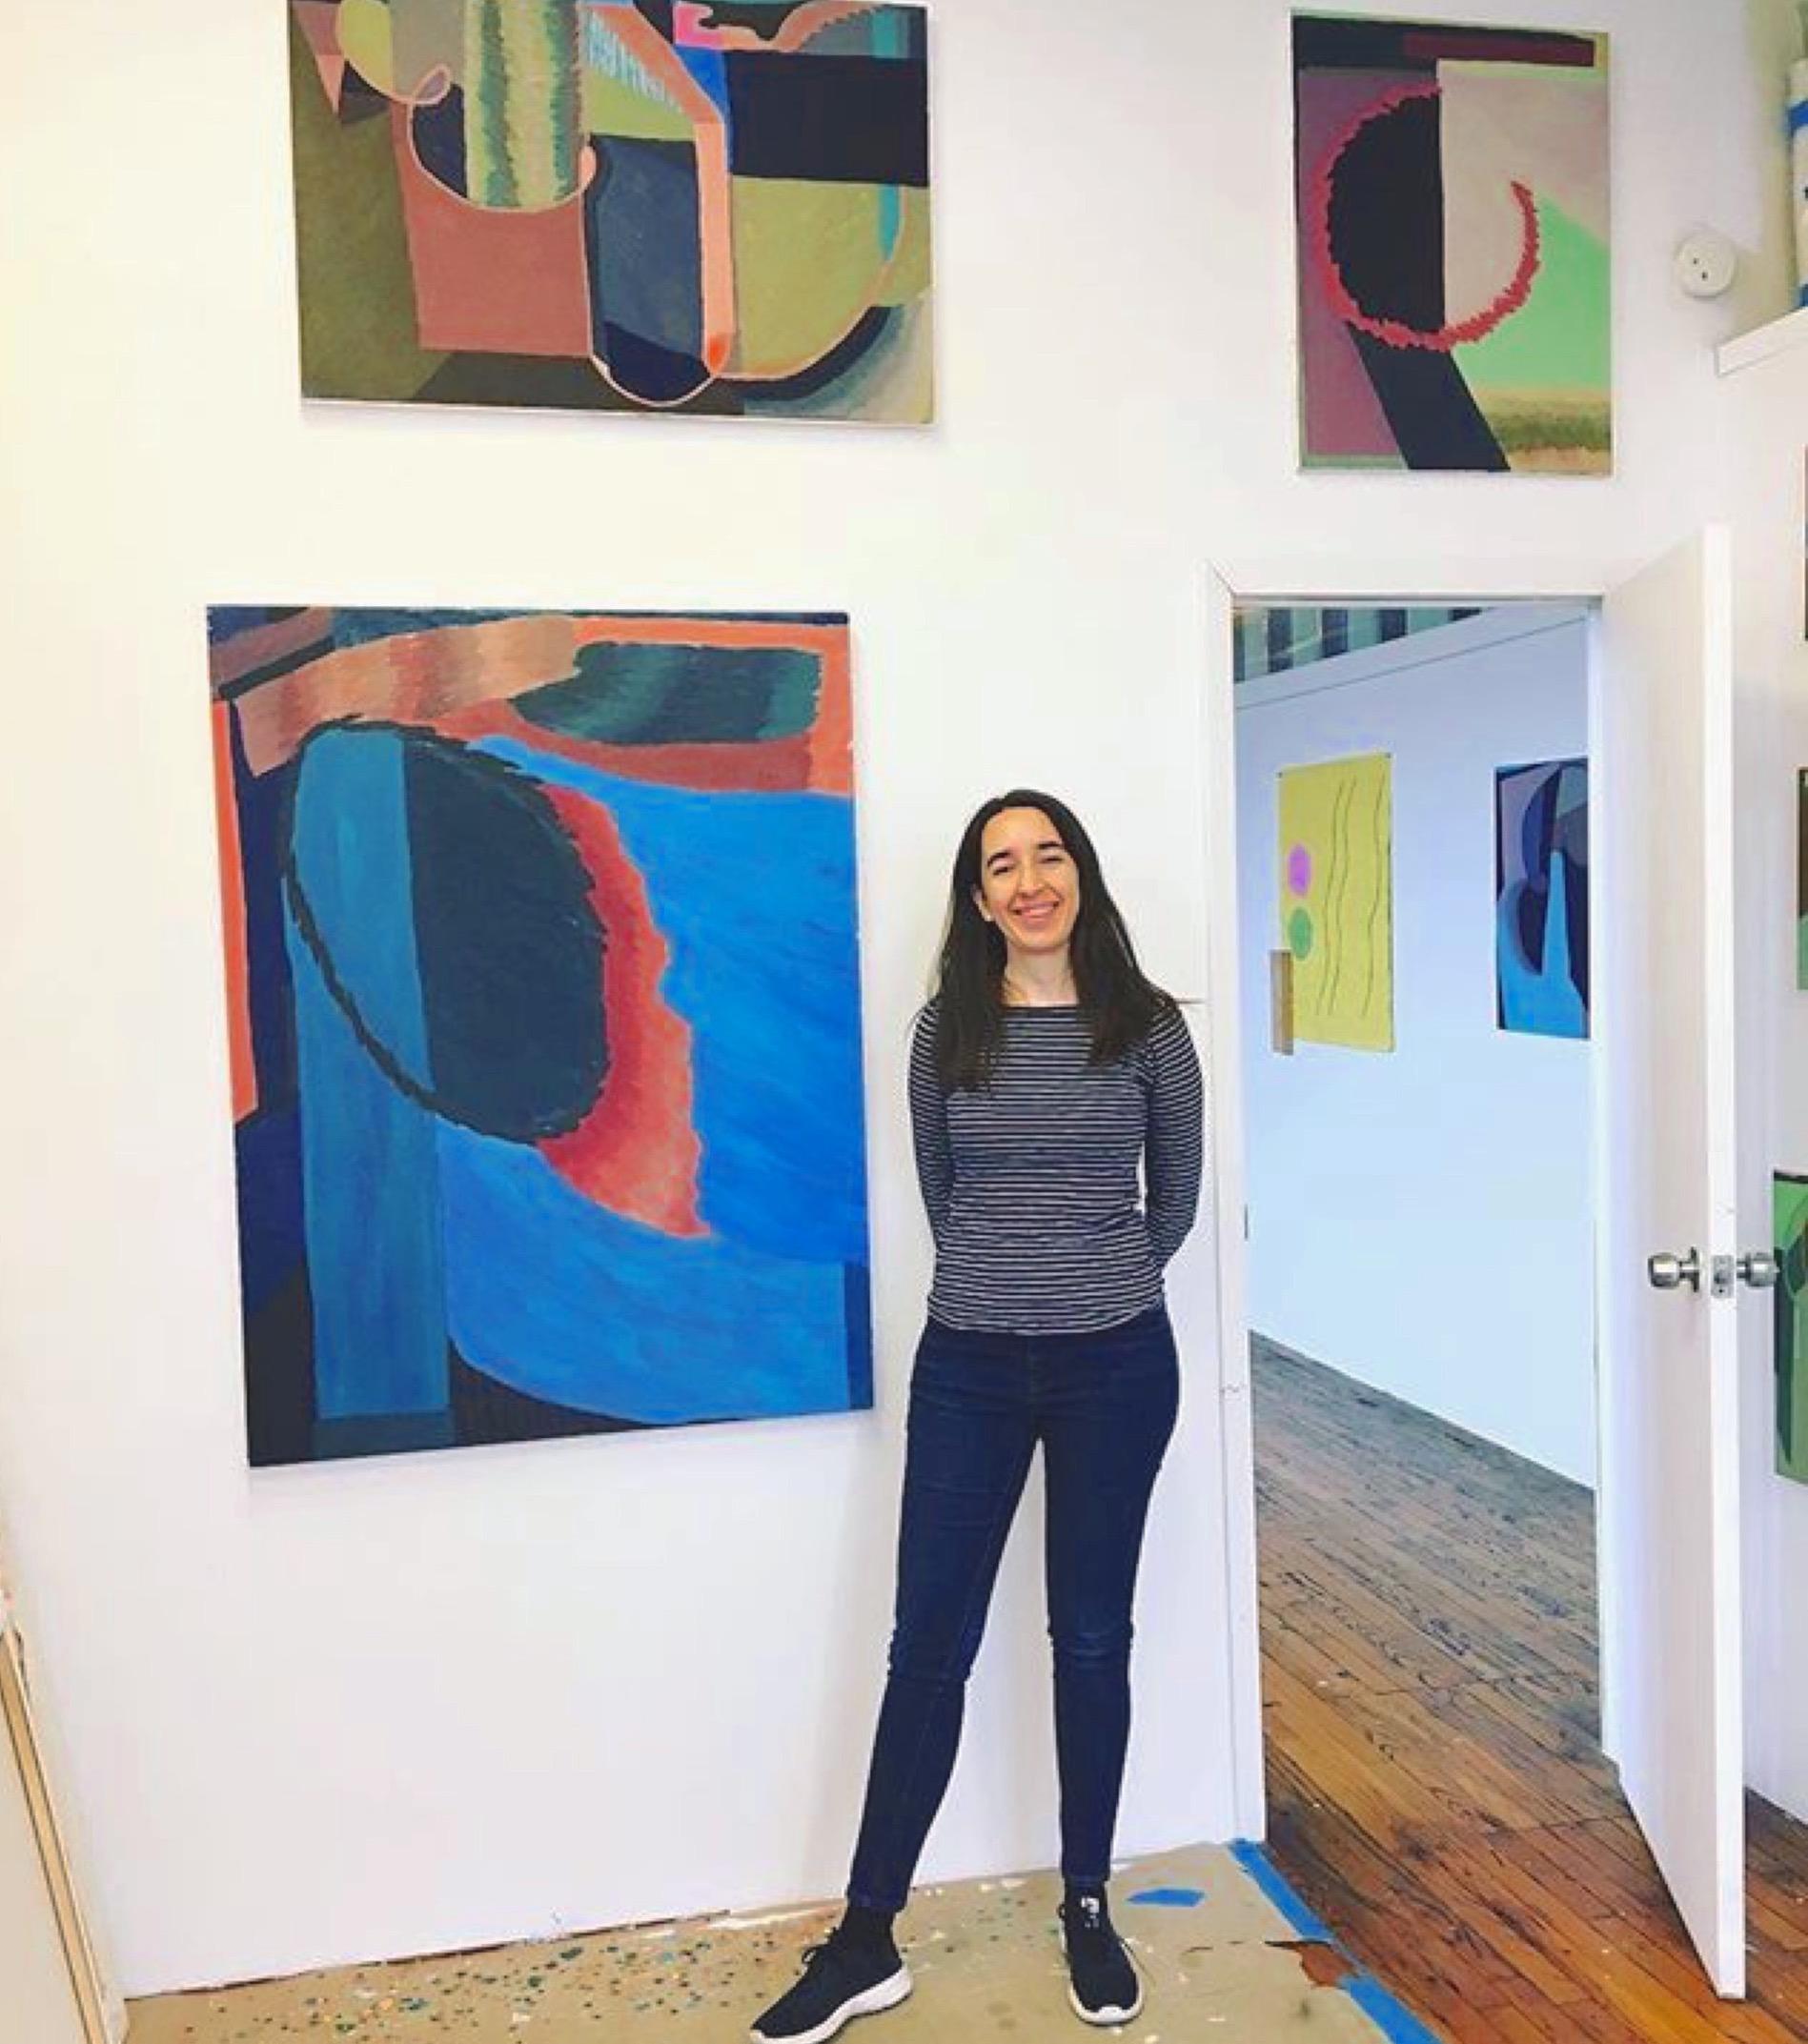 Our gracious host :) Liz Ainslie in her studio at 2016 Bushwick Open Studios